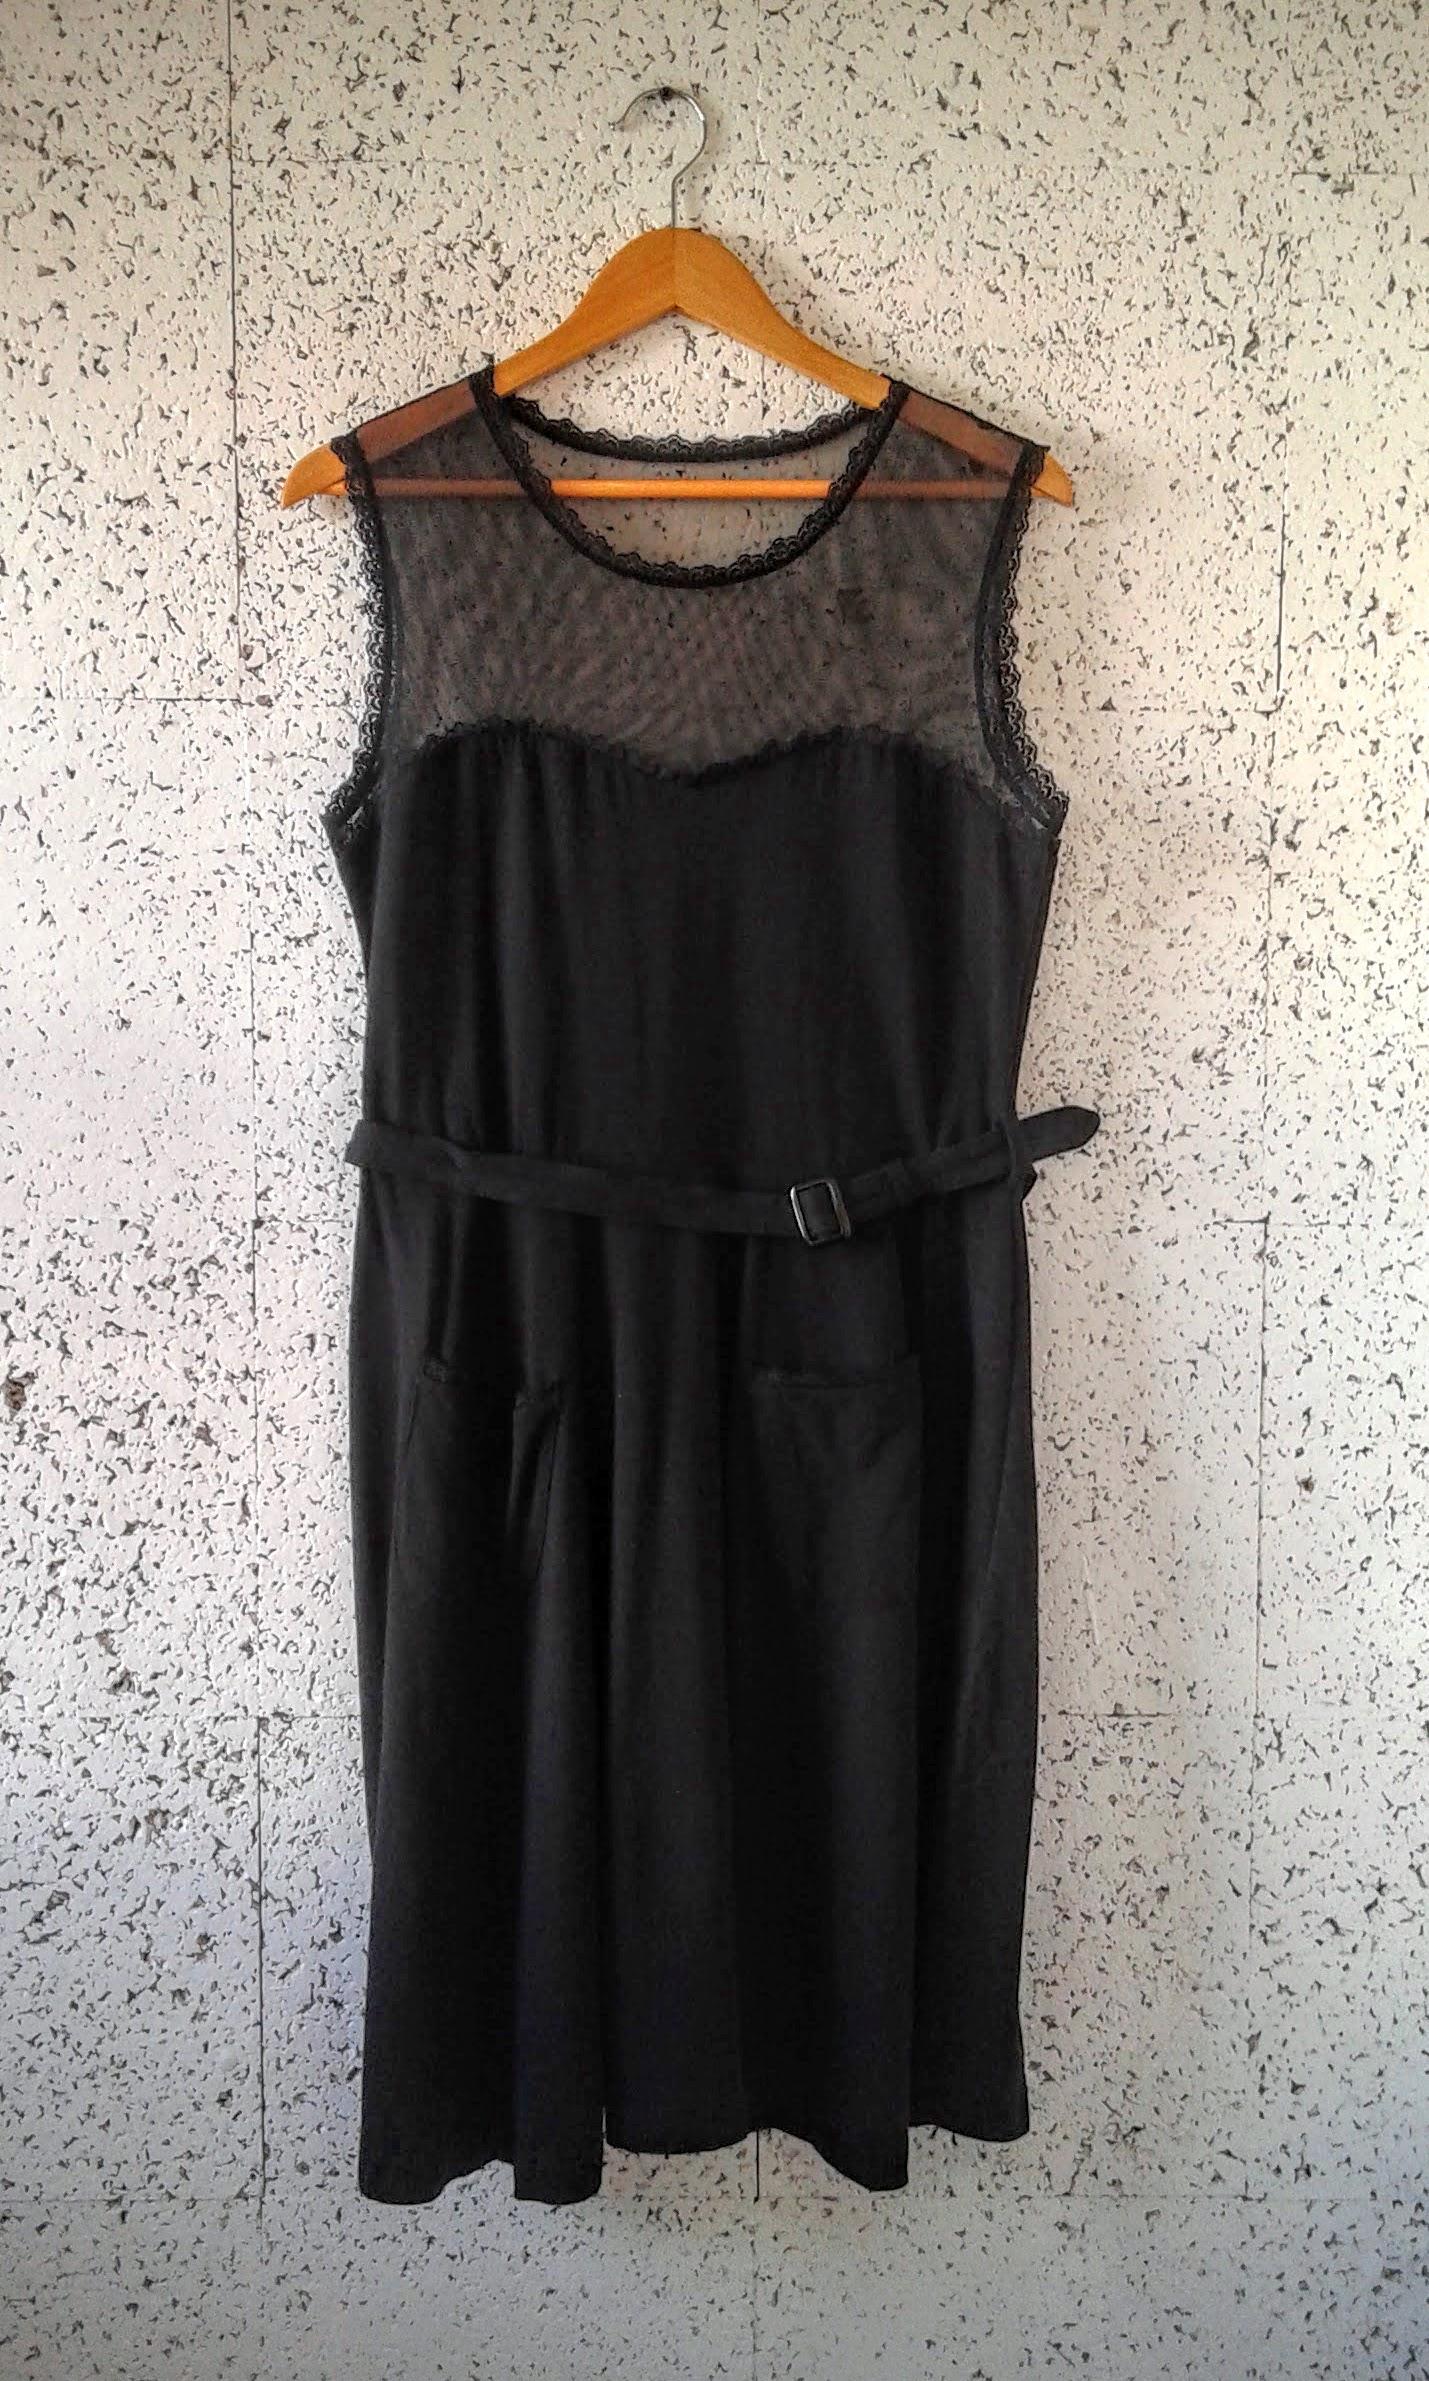 Effie's Heart dress; Size XL, $32